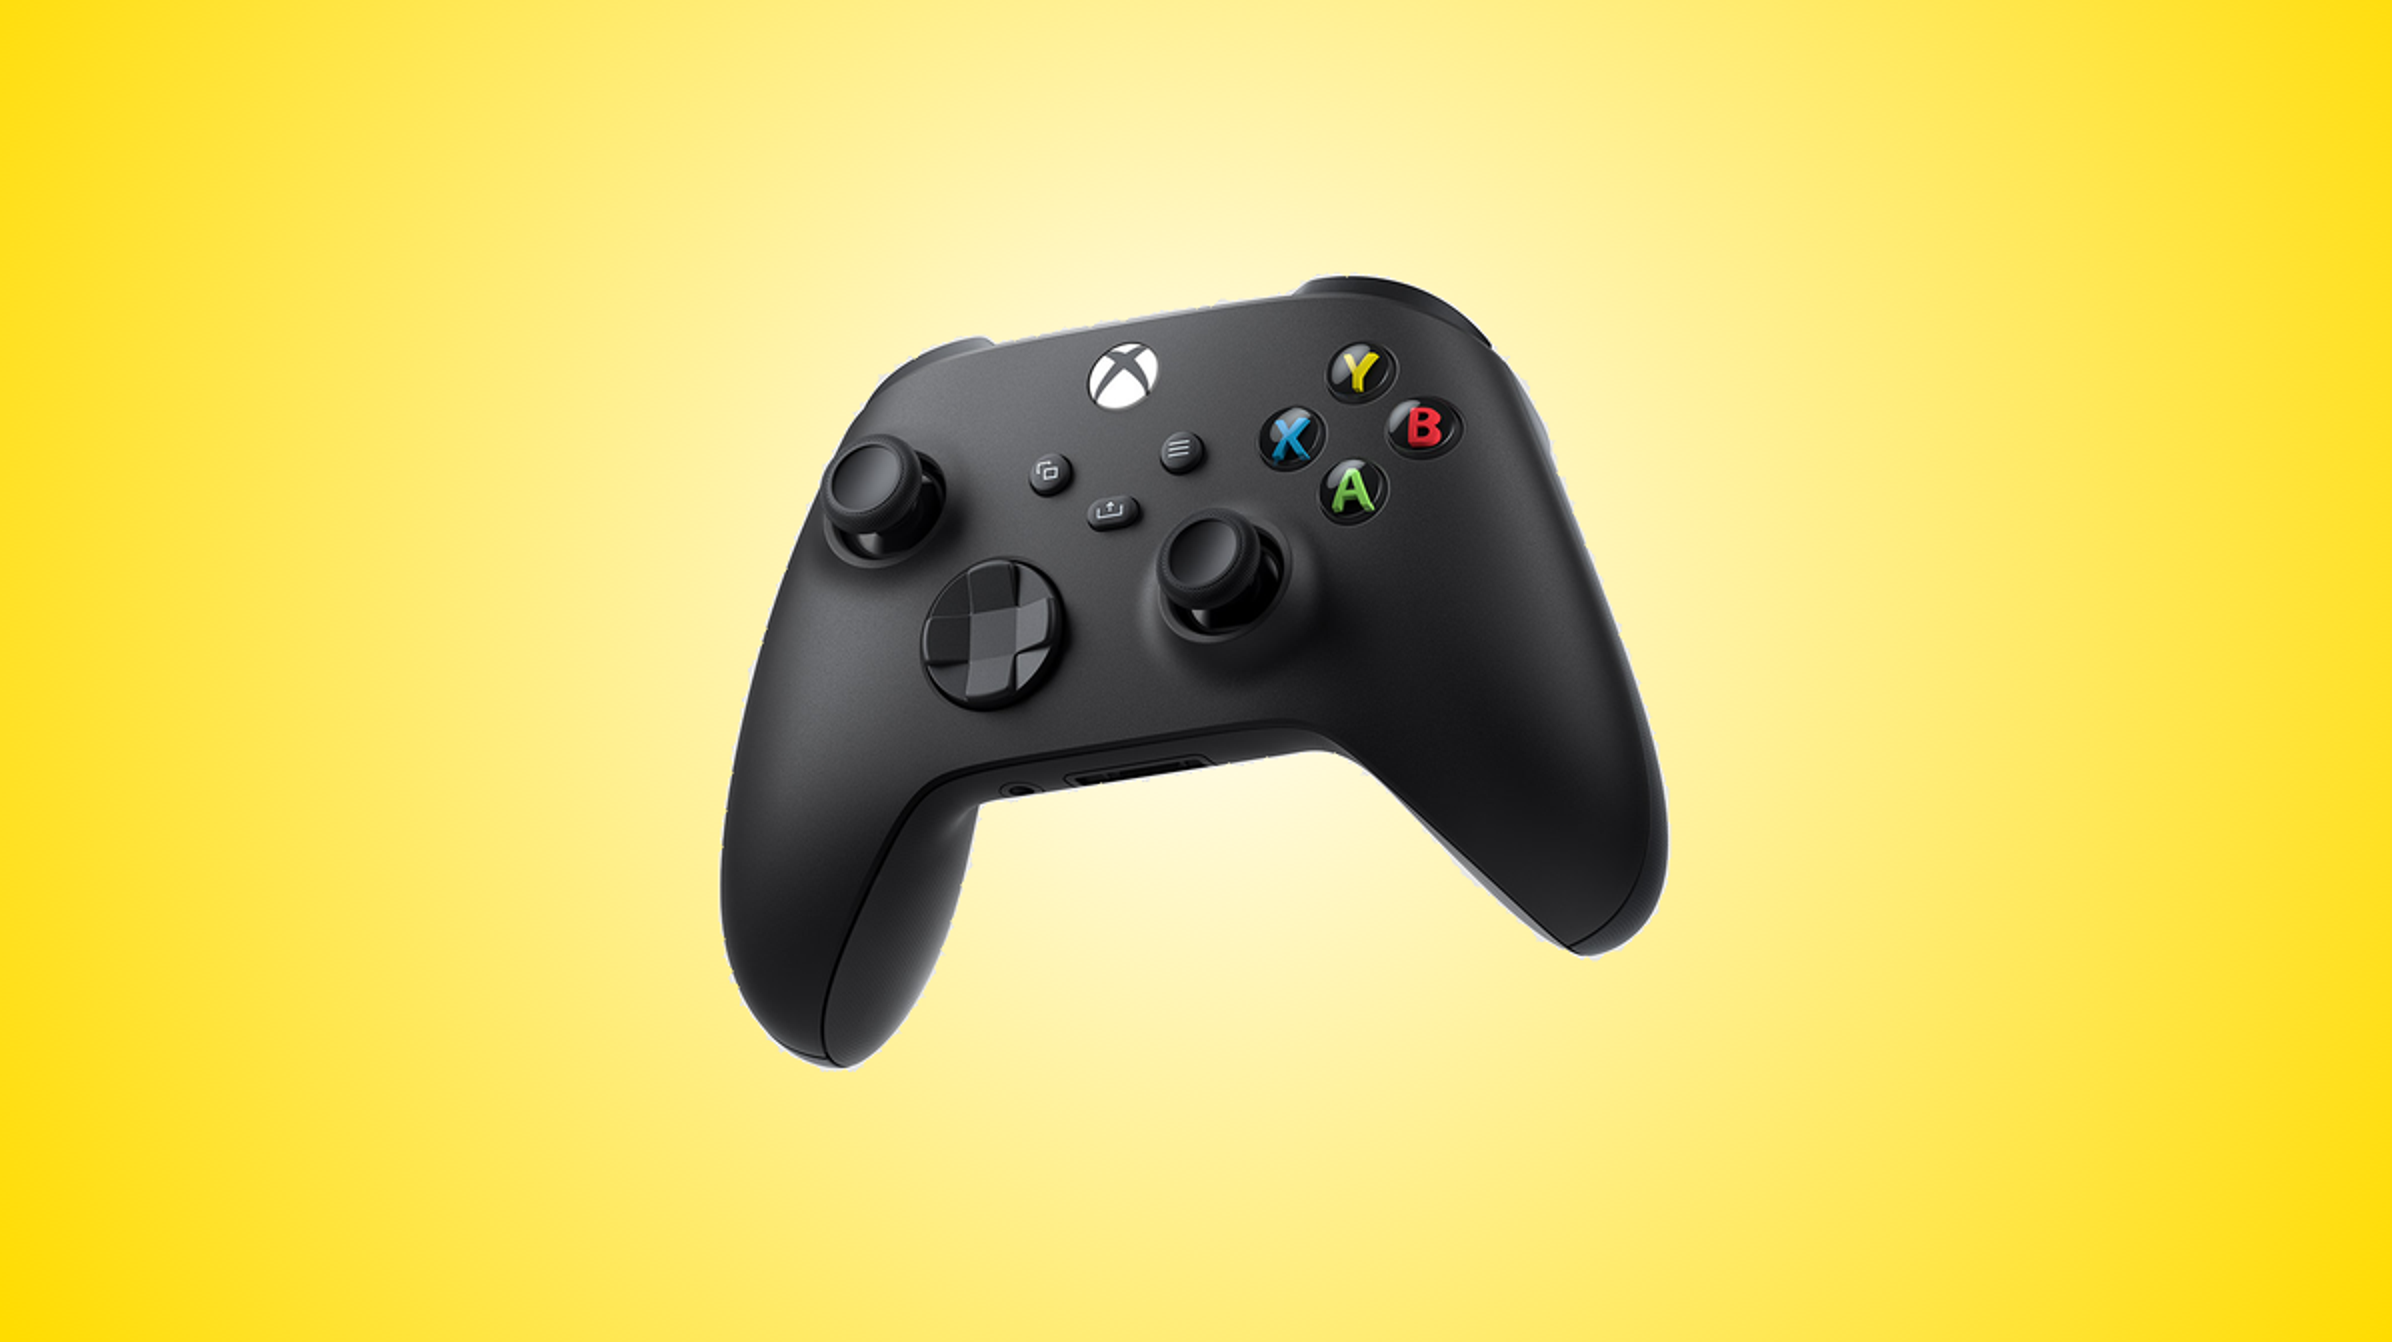 Cómo conectar un control inalámbrico Xbox con un teléfono Android